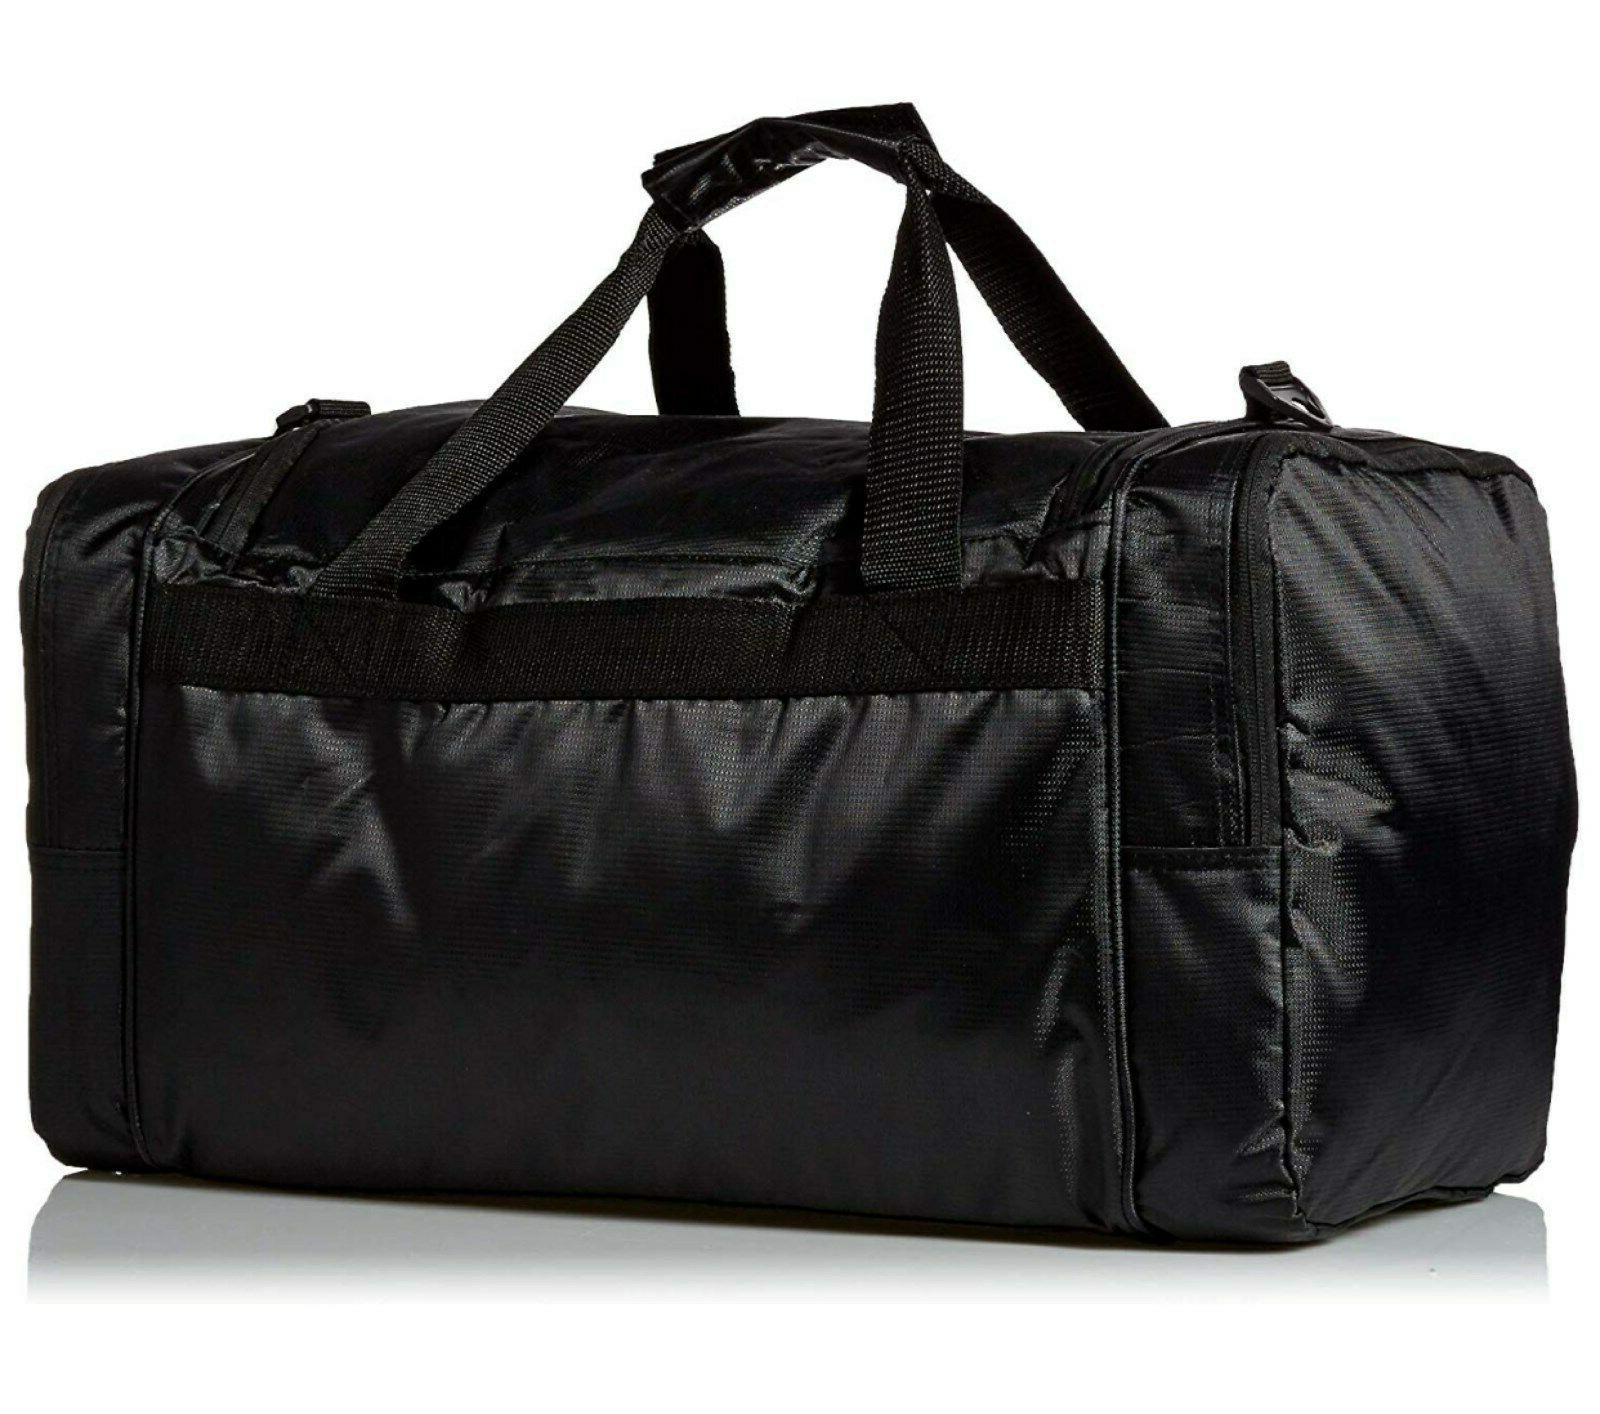 San Jose Sharks Gym Luggage Medium Duffel Bag